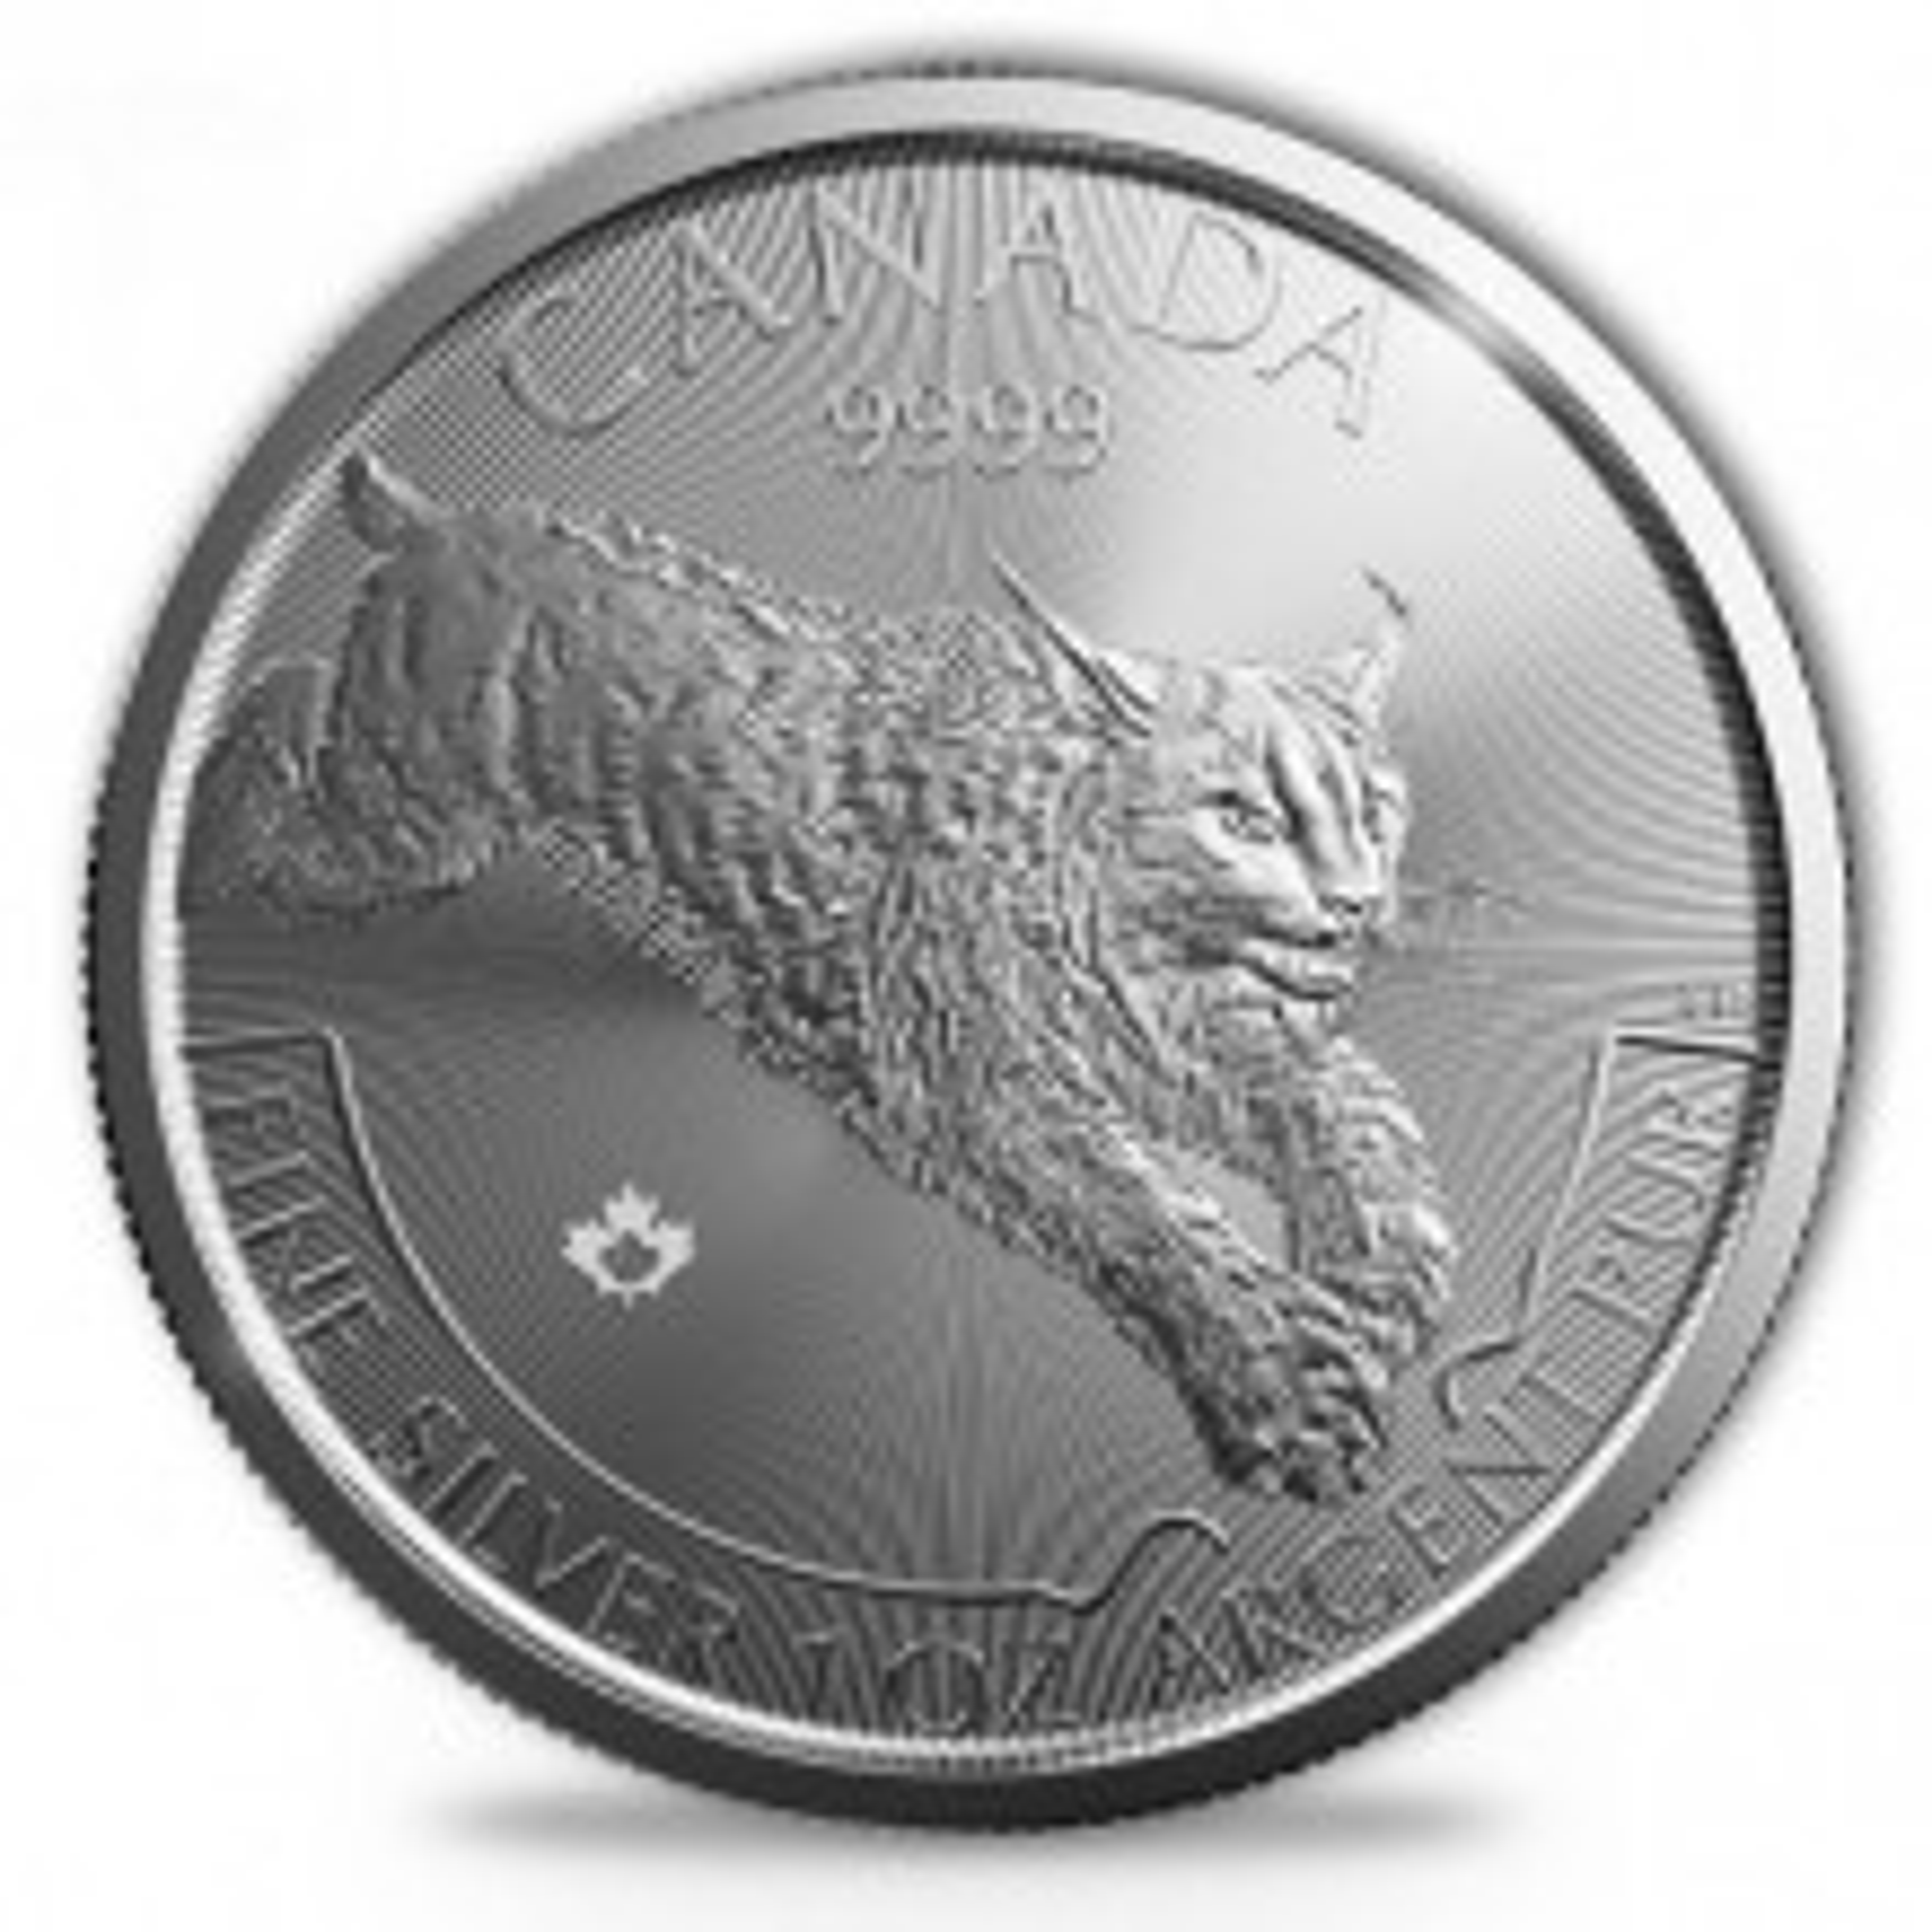 1 troy ounce silver Lynx - Predator series - 2017